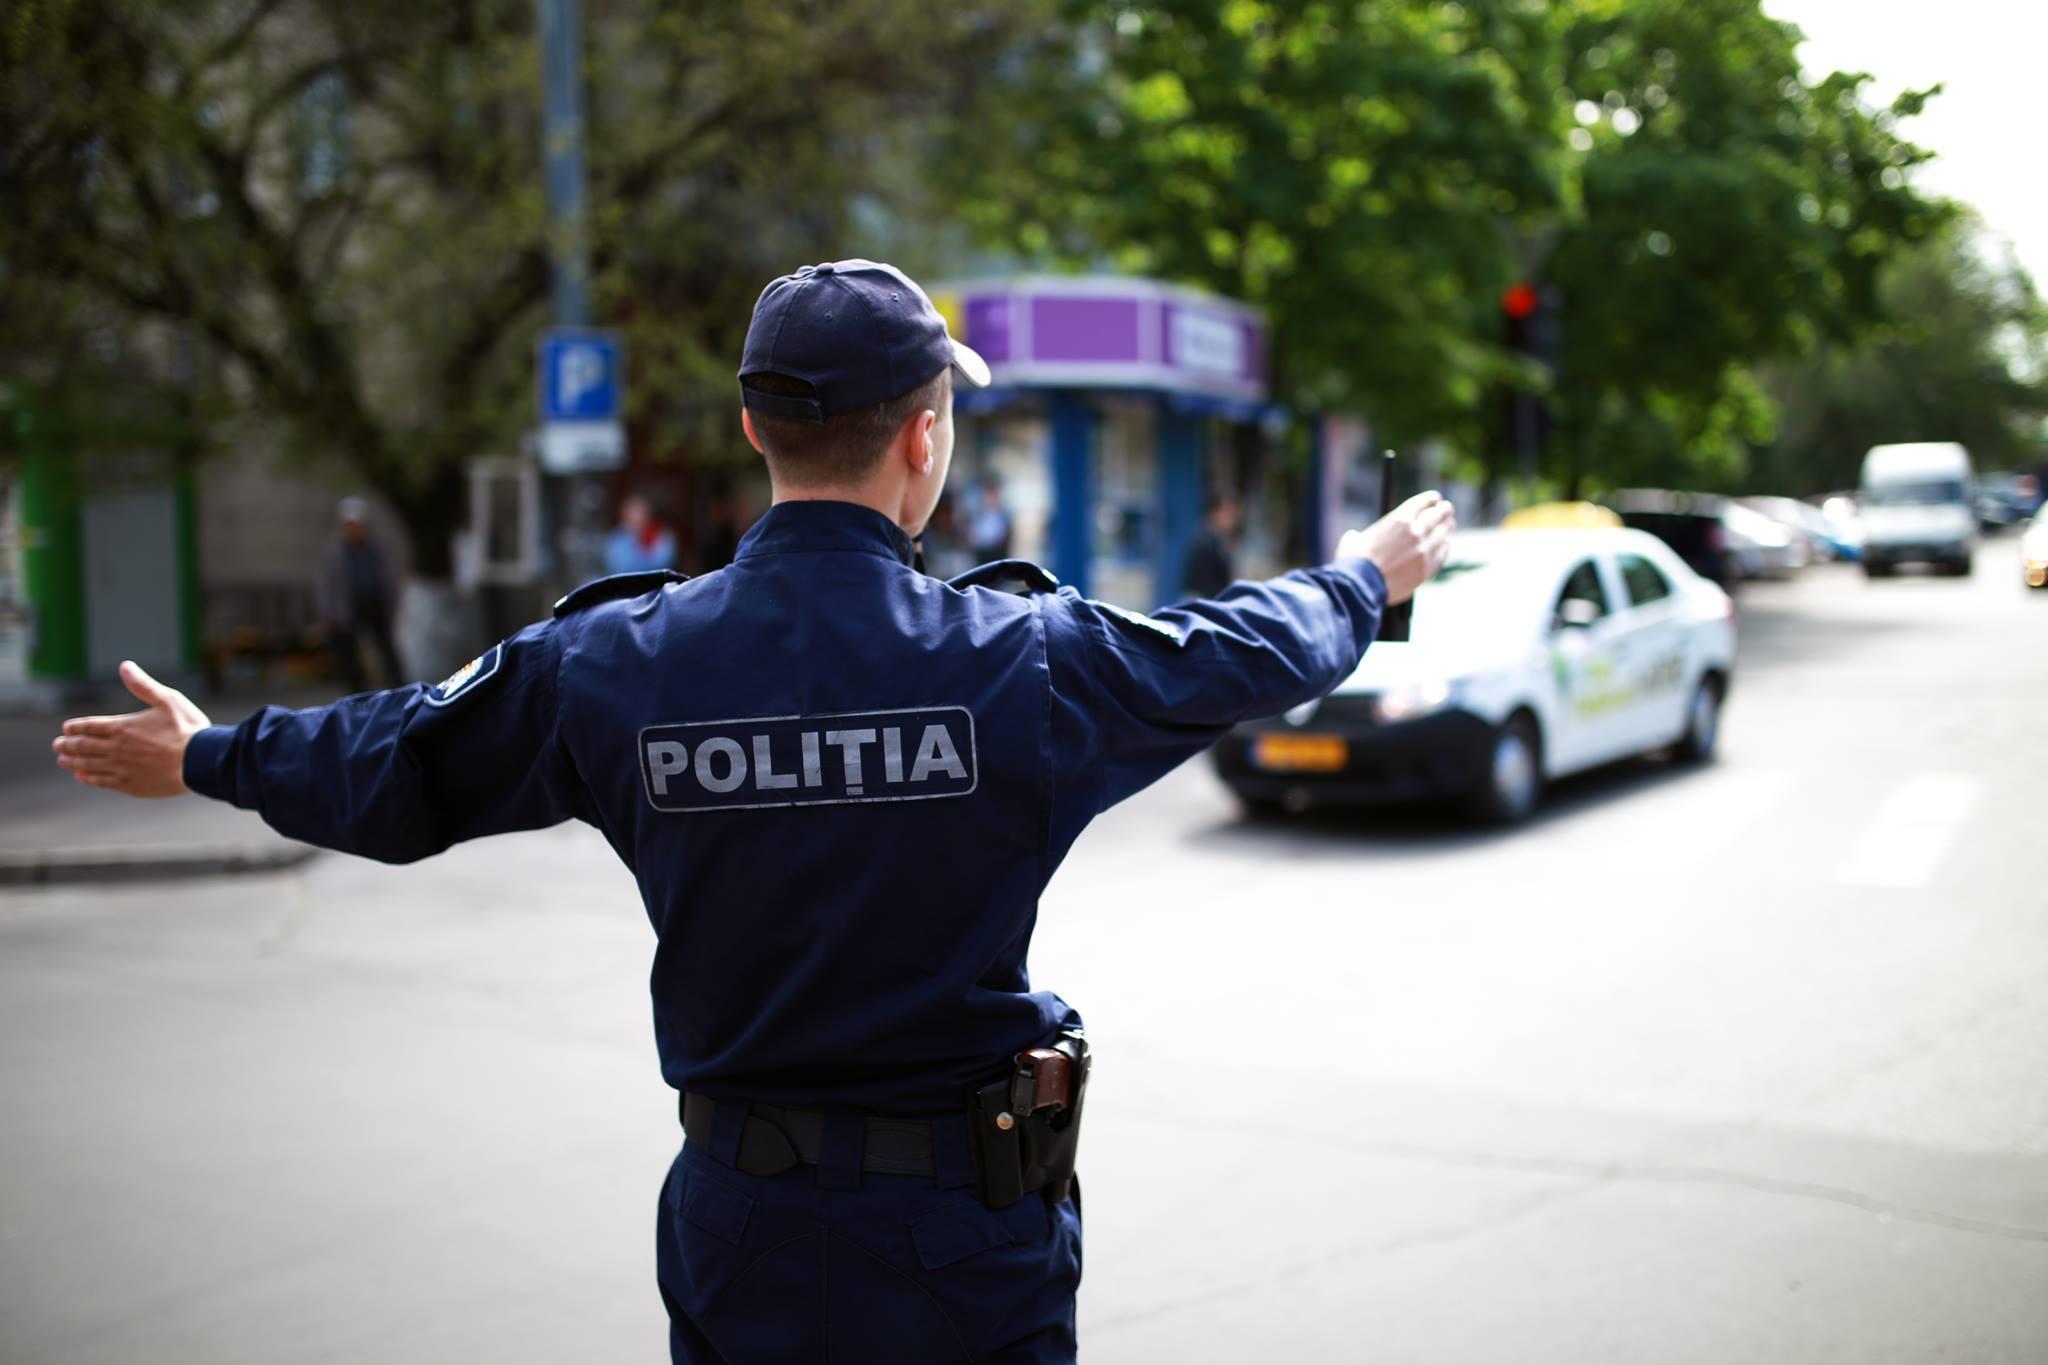 reforma politiei, moldova 2018, mai jizdan, guvernul filip, cavacaliuc igp, alexandru pinzari